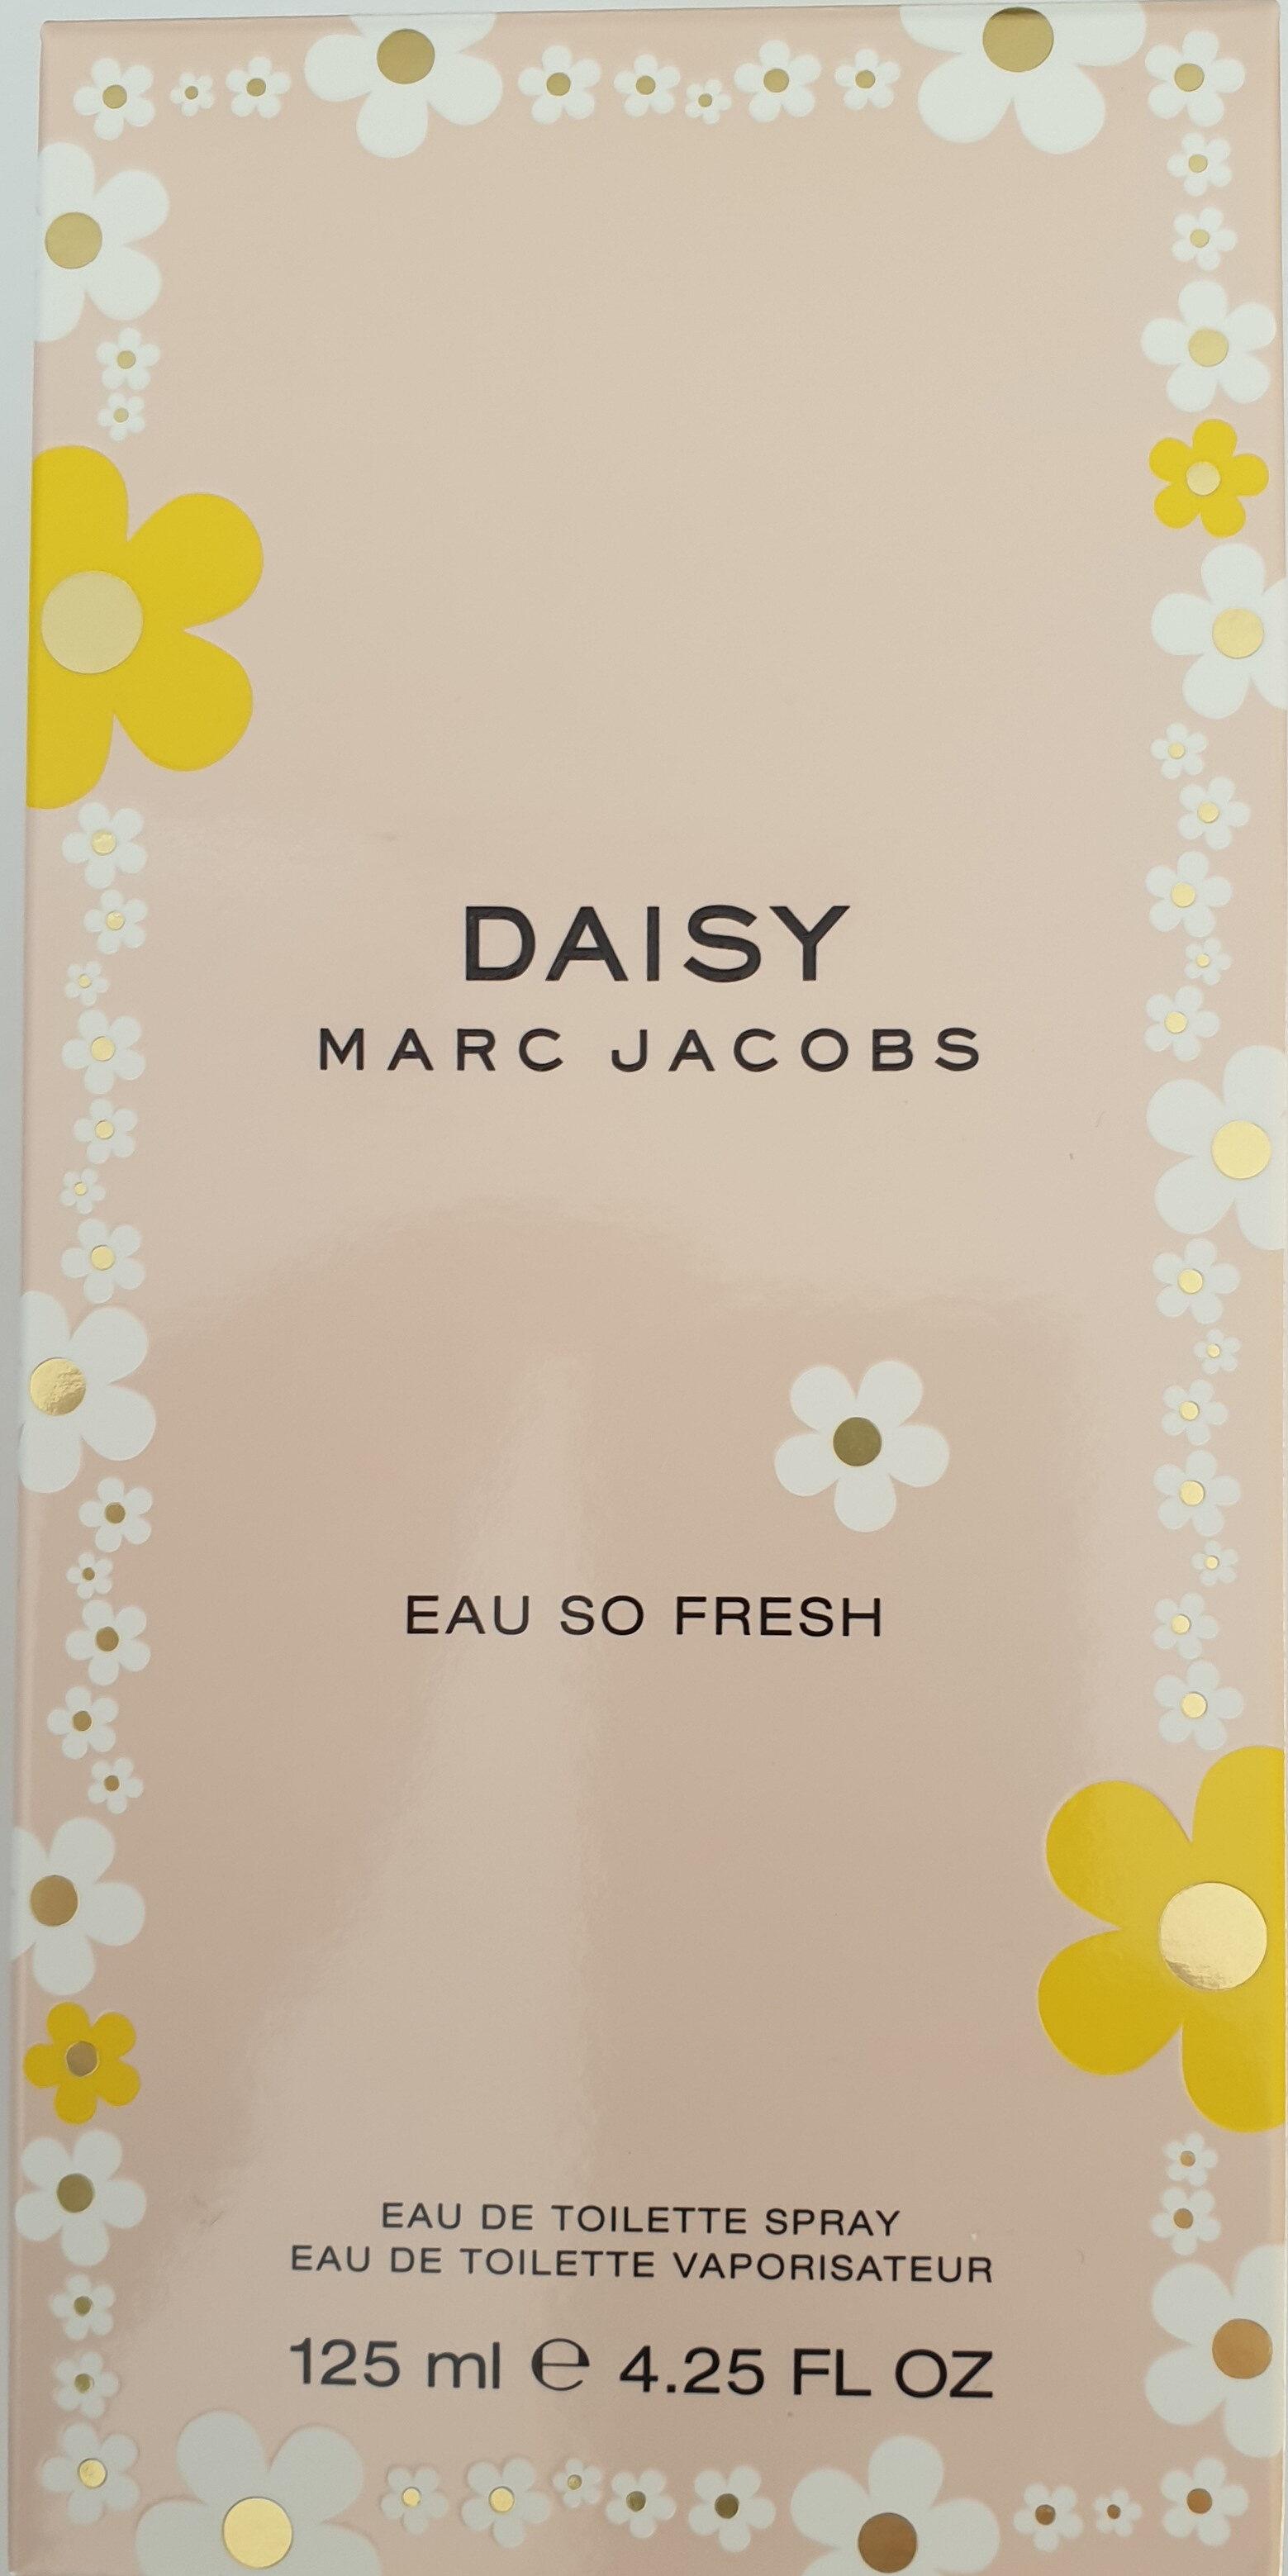 Daisy Eau detoilette spray - Product